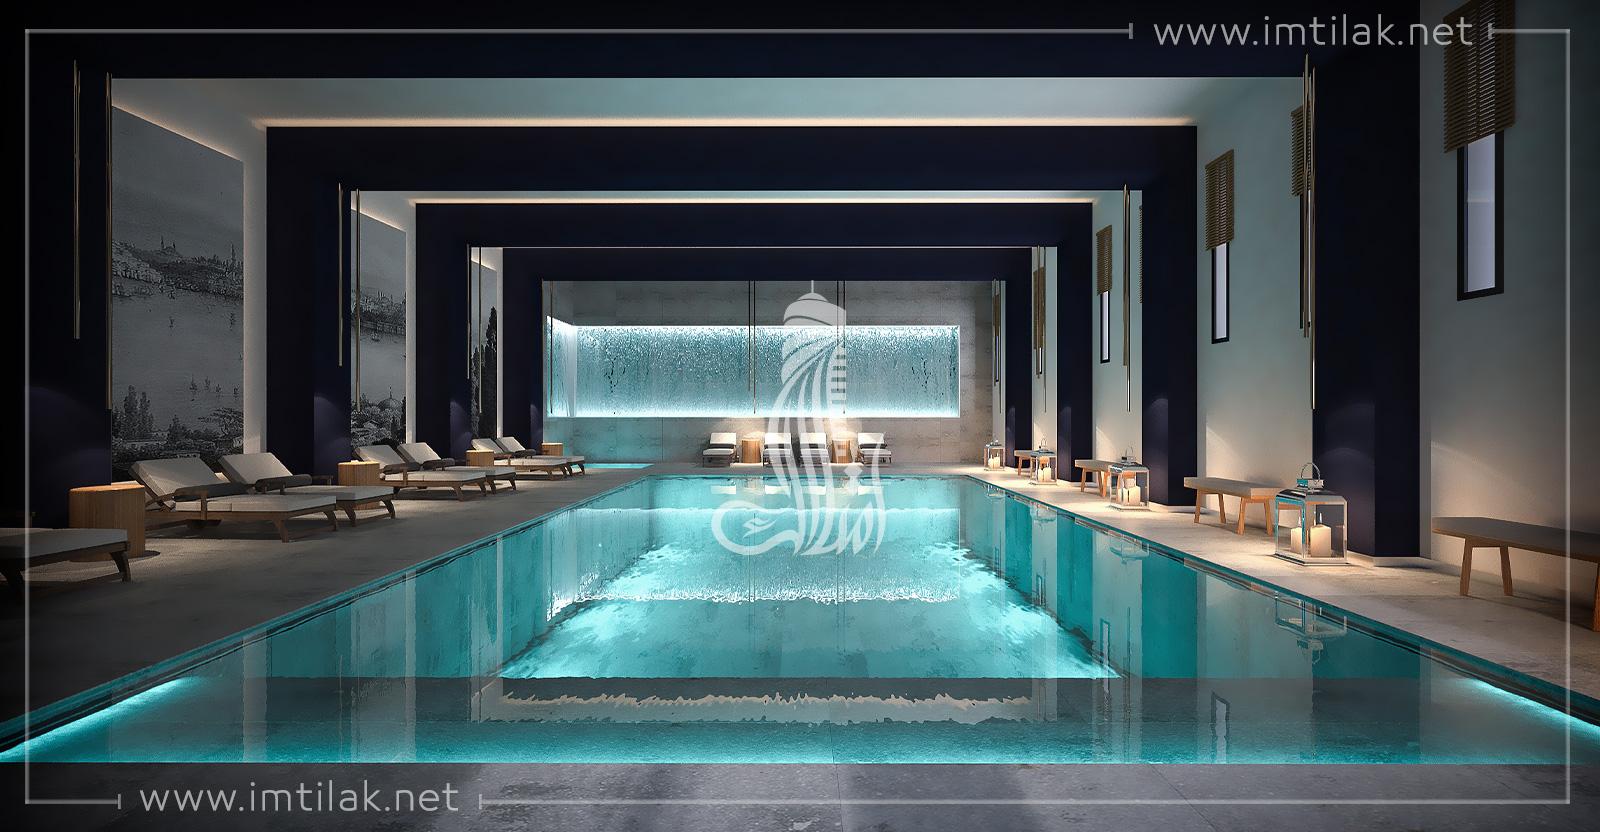 IMT-۹۵ پروژه مسکونی استانبول ۳